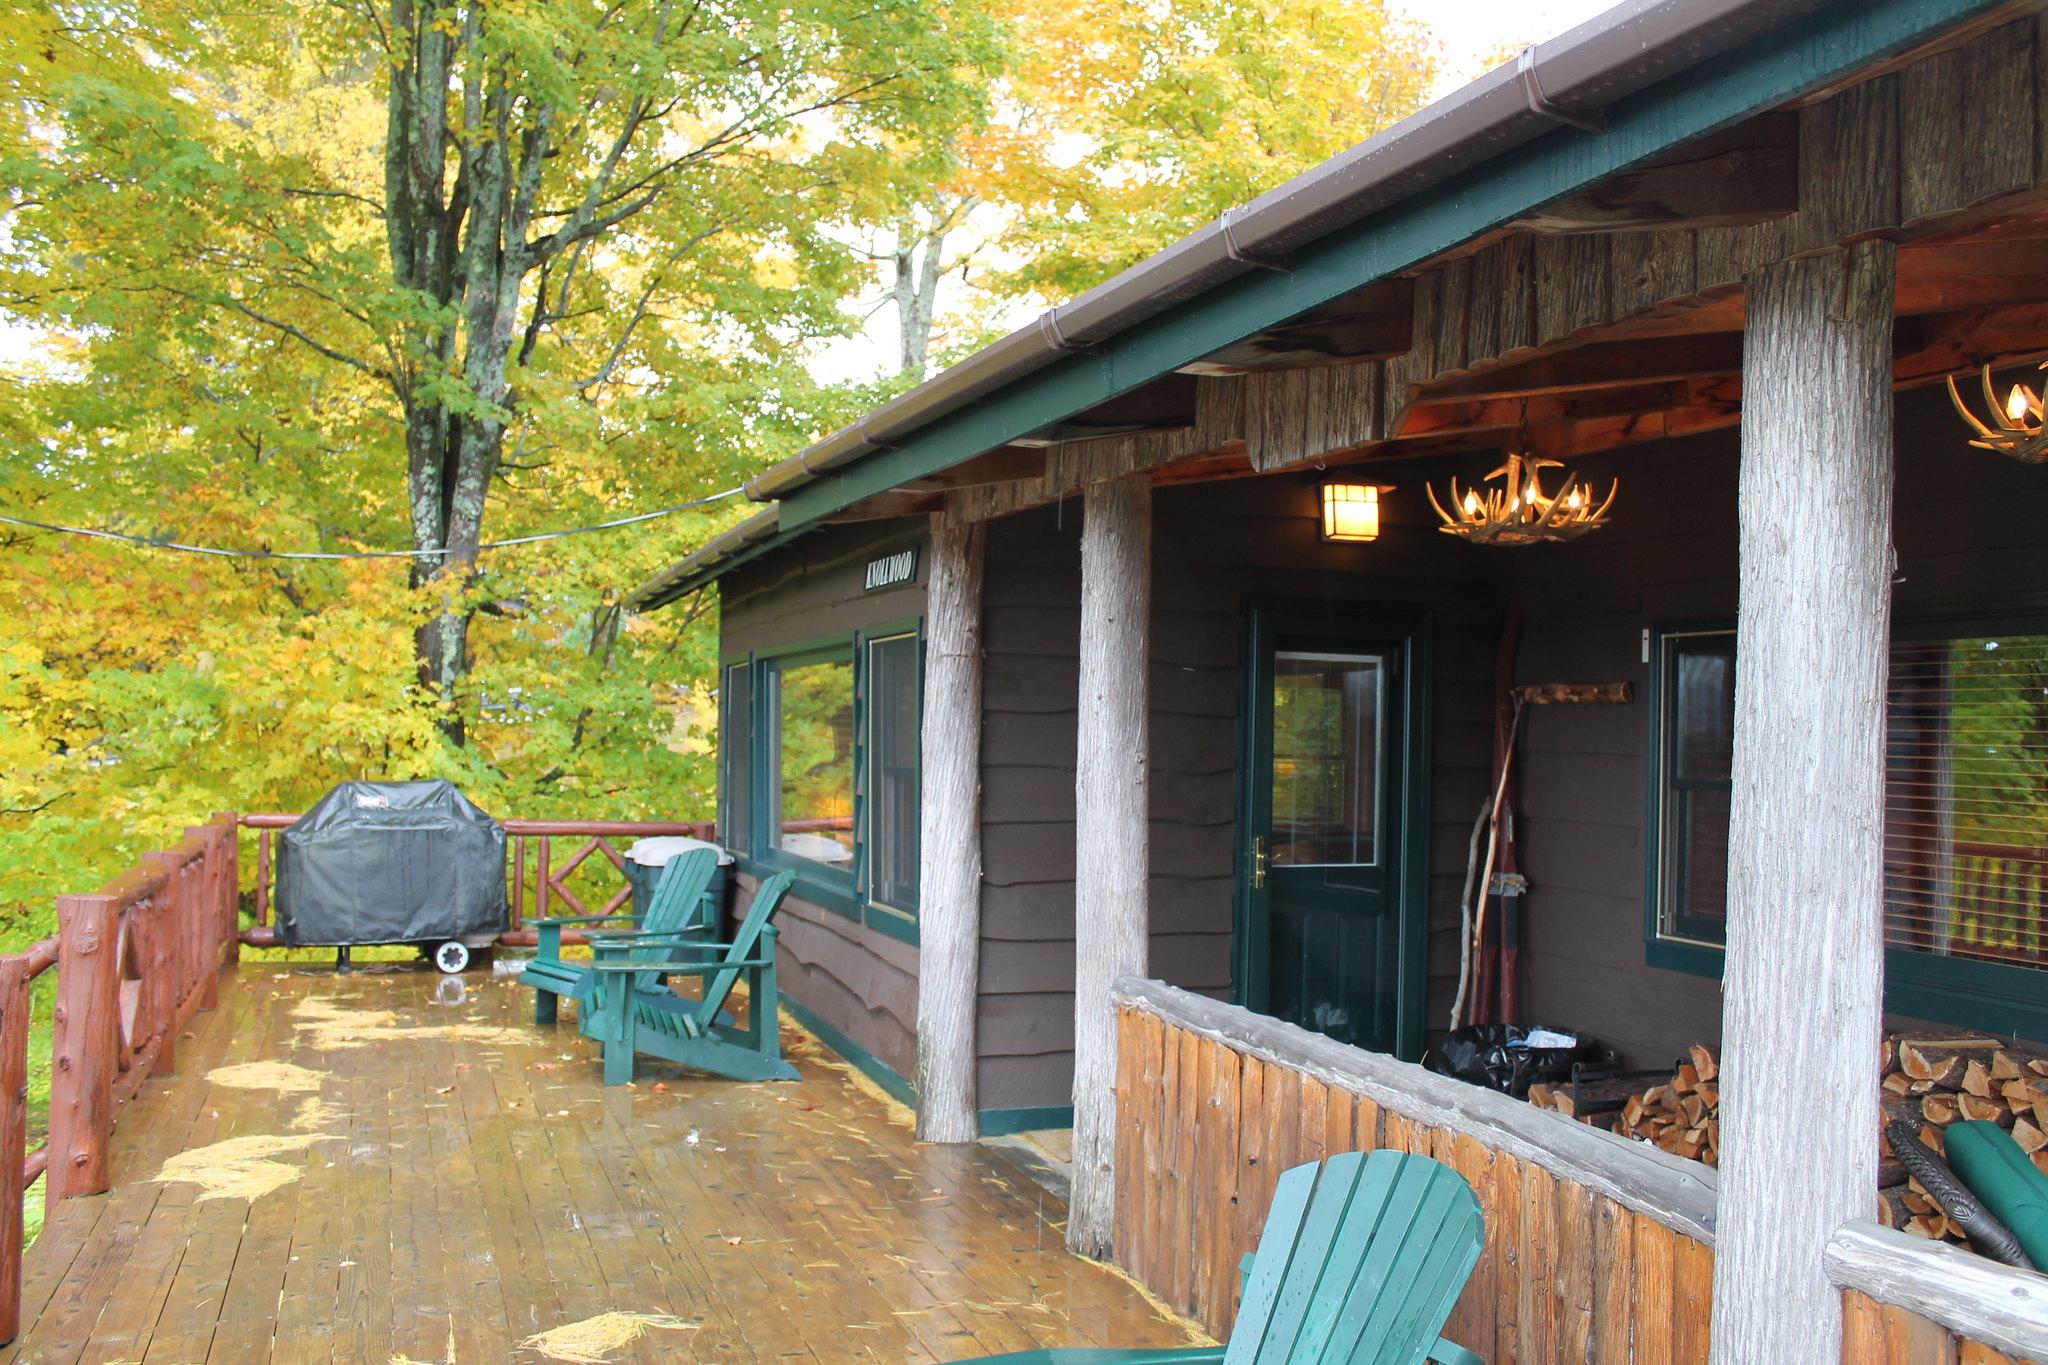 vacation of photo rent rental idyllwild cabins idyllcreek att ny a idlewild frame upstate cabin x